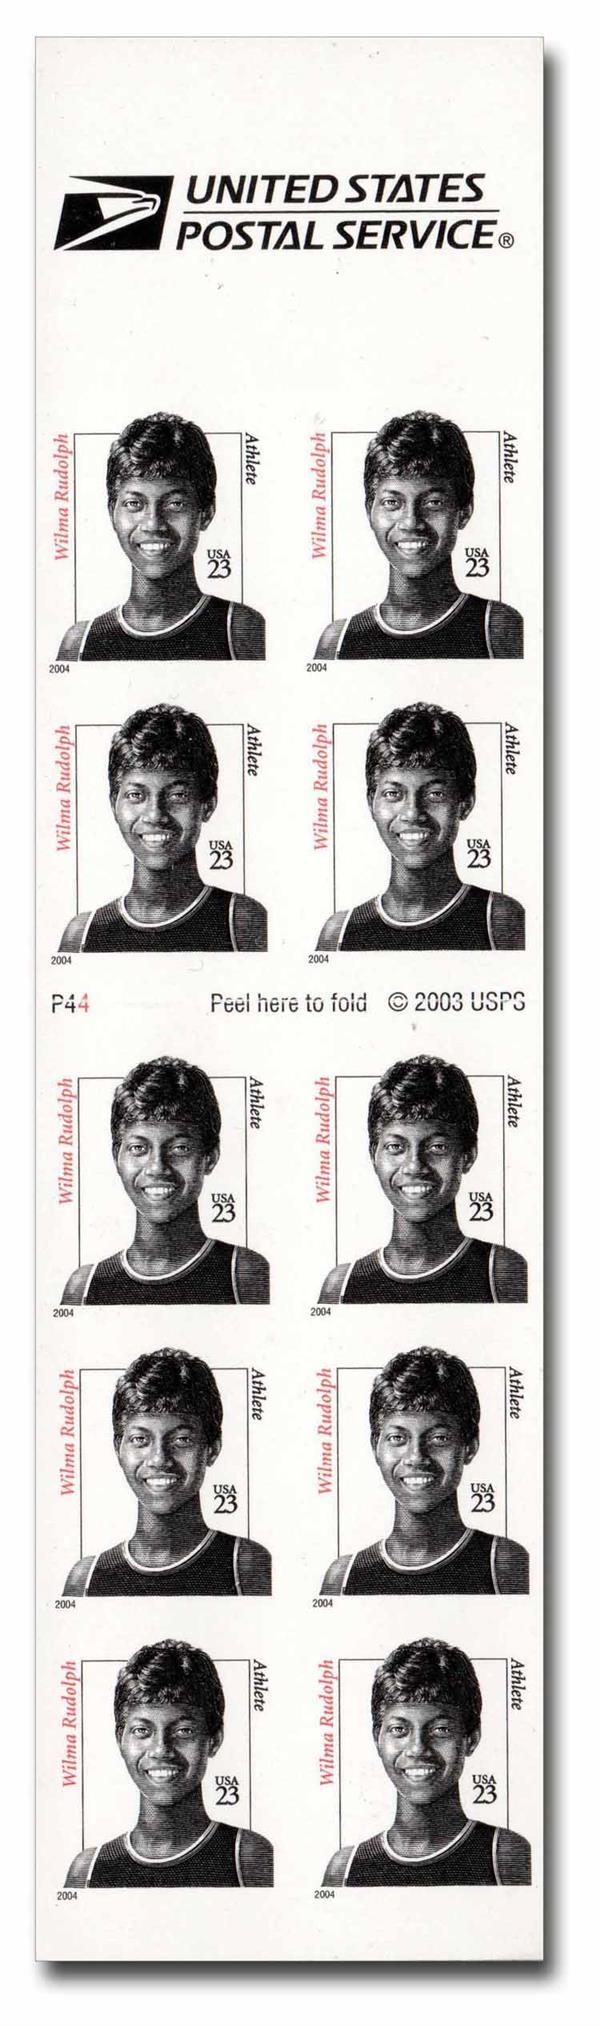 2004 23c Wilma Rudolph, booklet pane 10